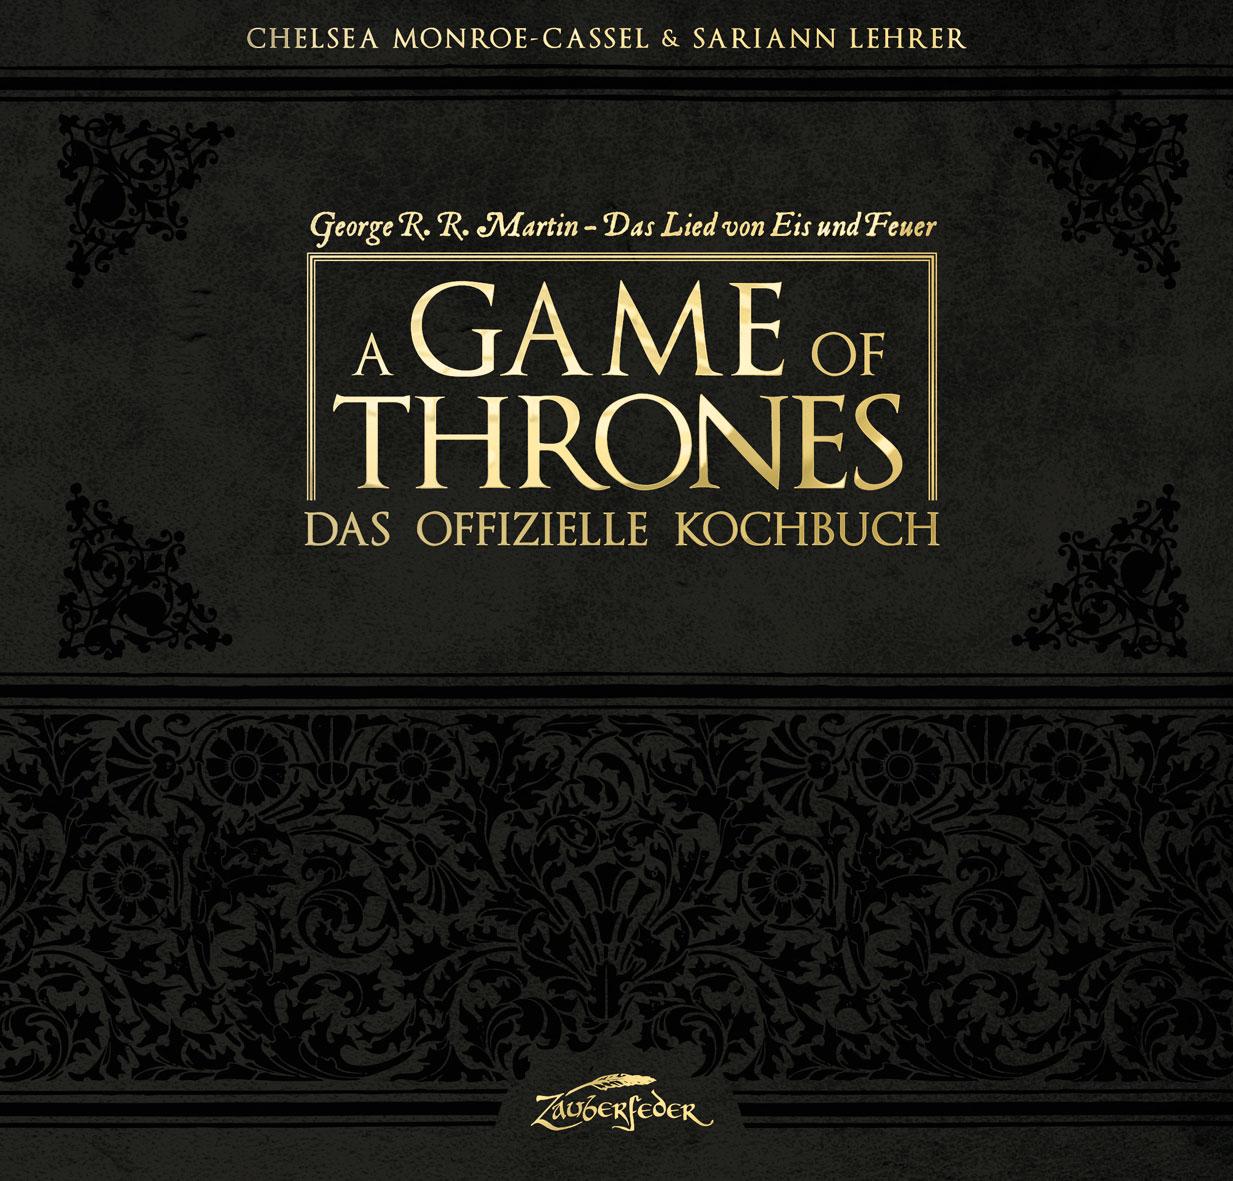 A Game of Thrones: Das offizielle Kochbuch - Chelsea Monroe-Cassel